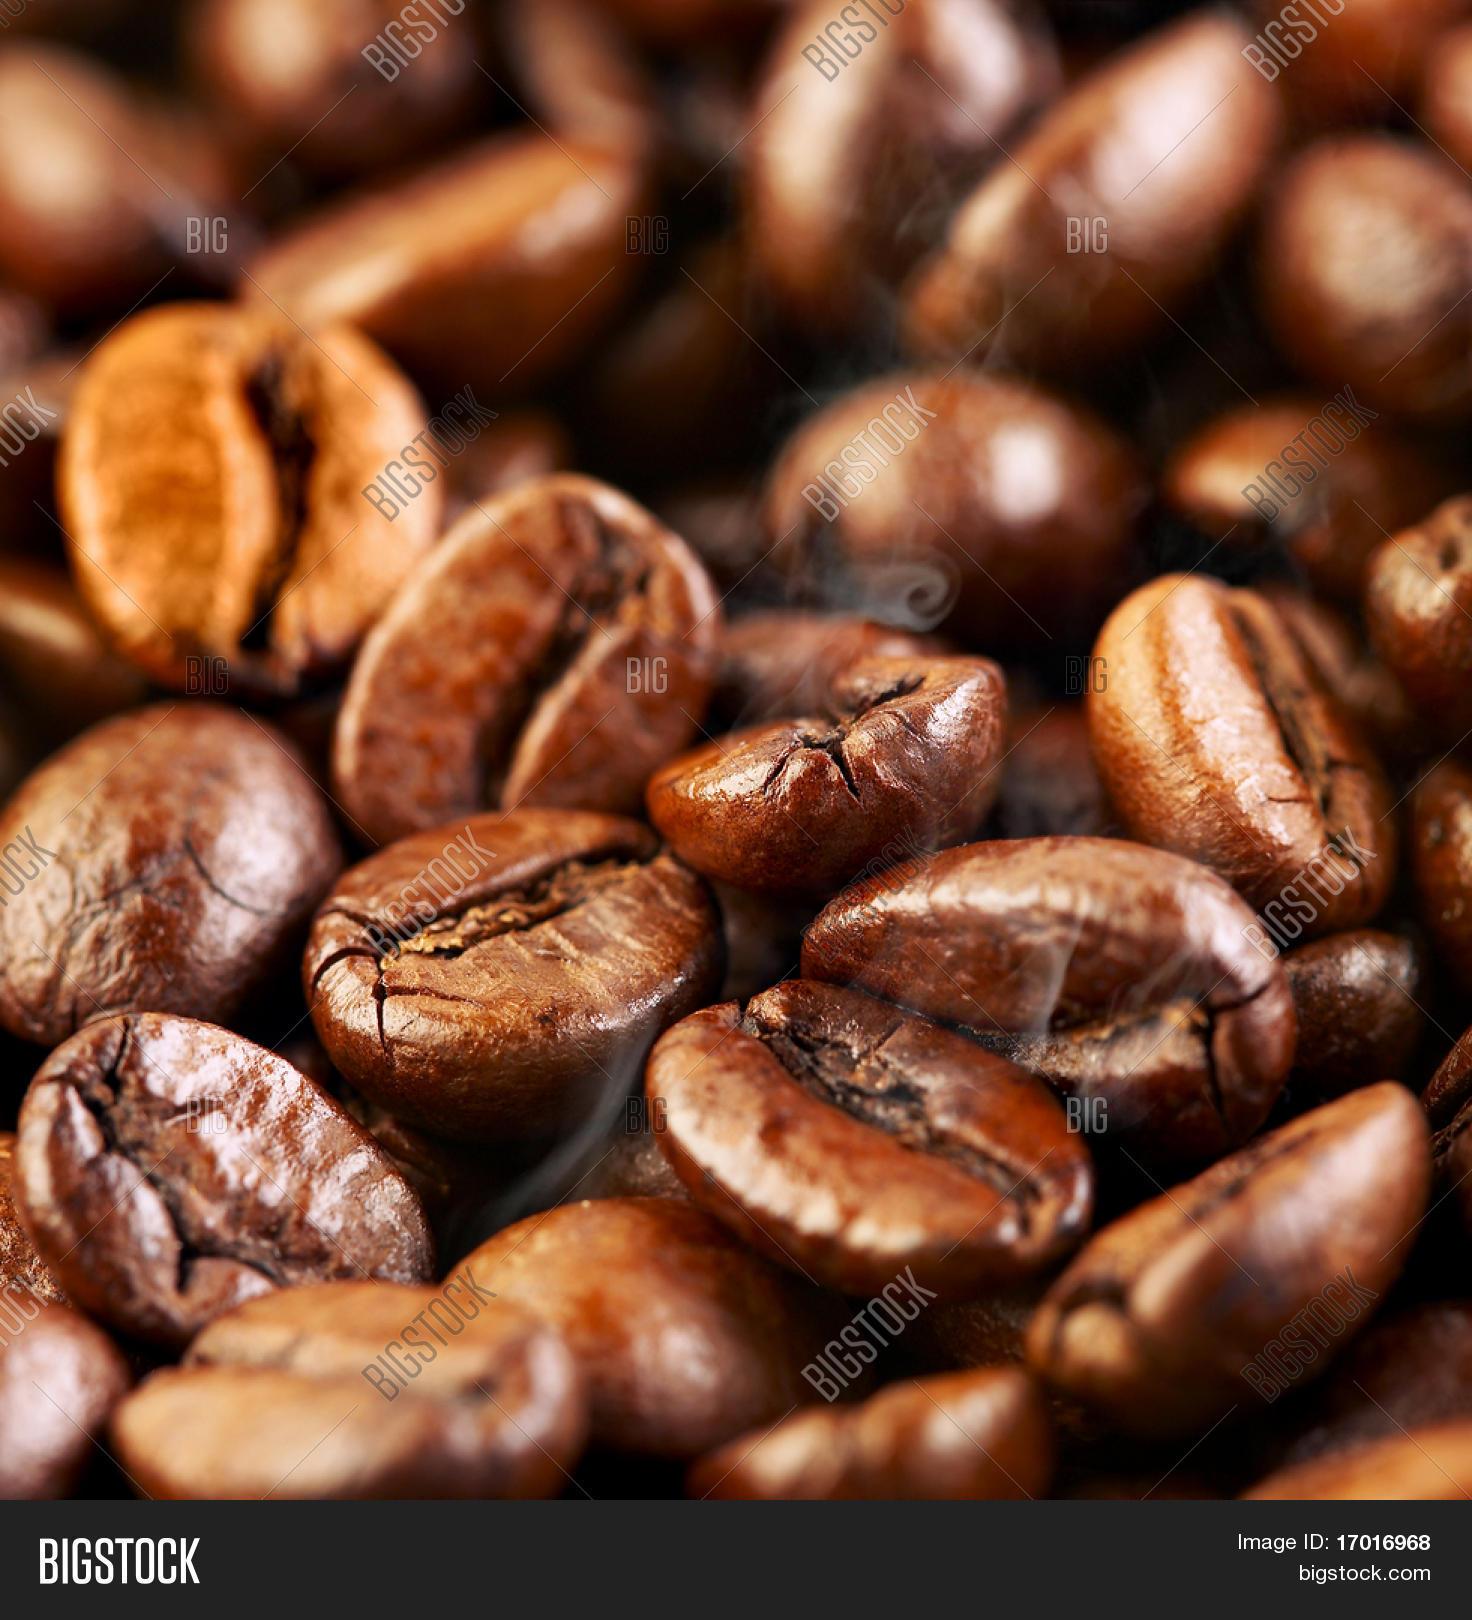 Fragrant Fried Coffee Image & Photo (Free Trial)   Bigstock